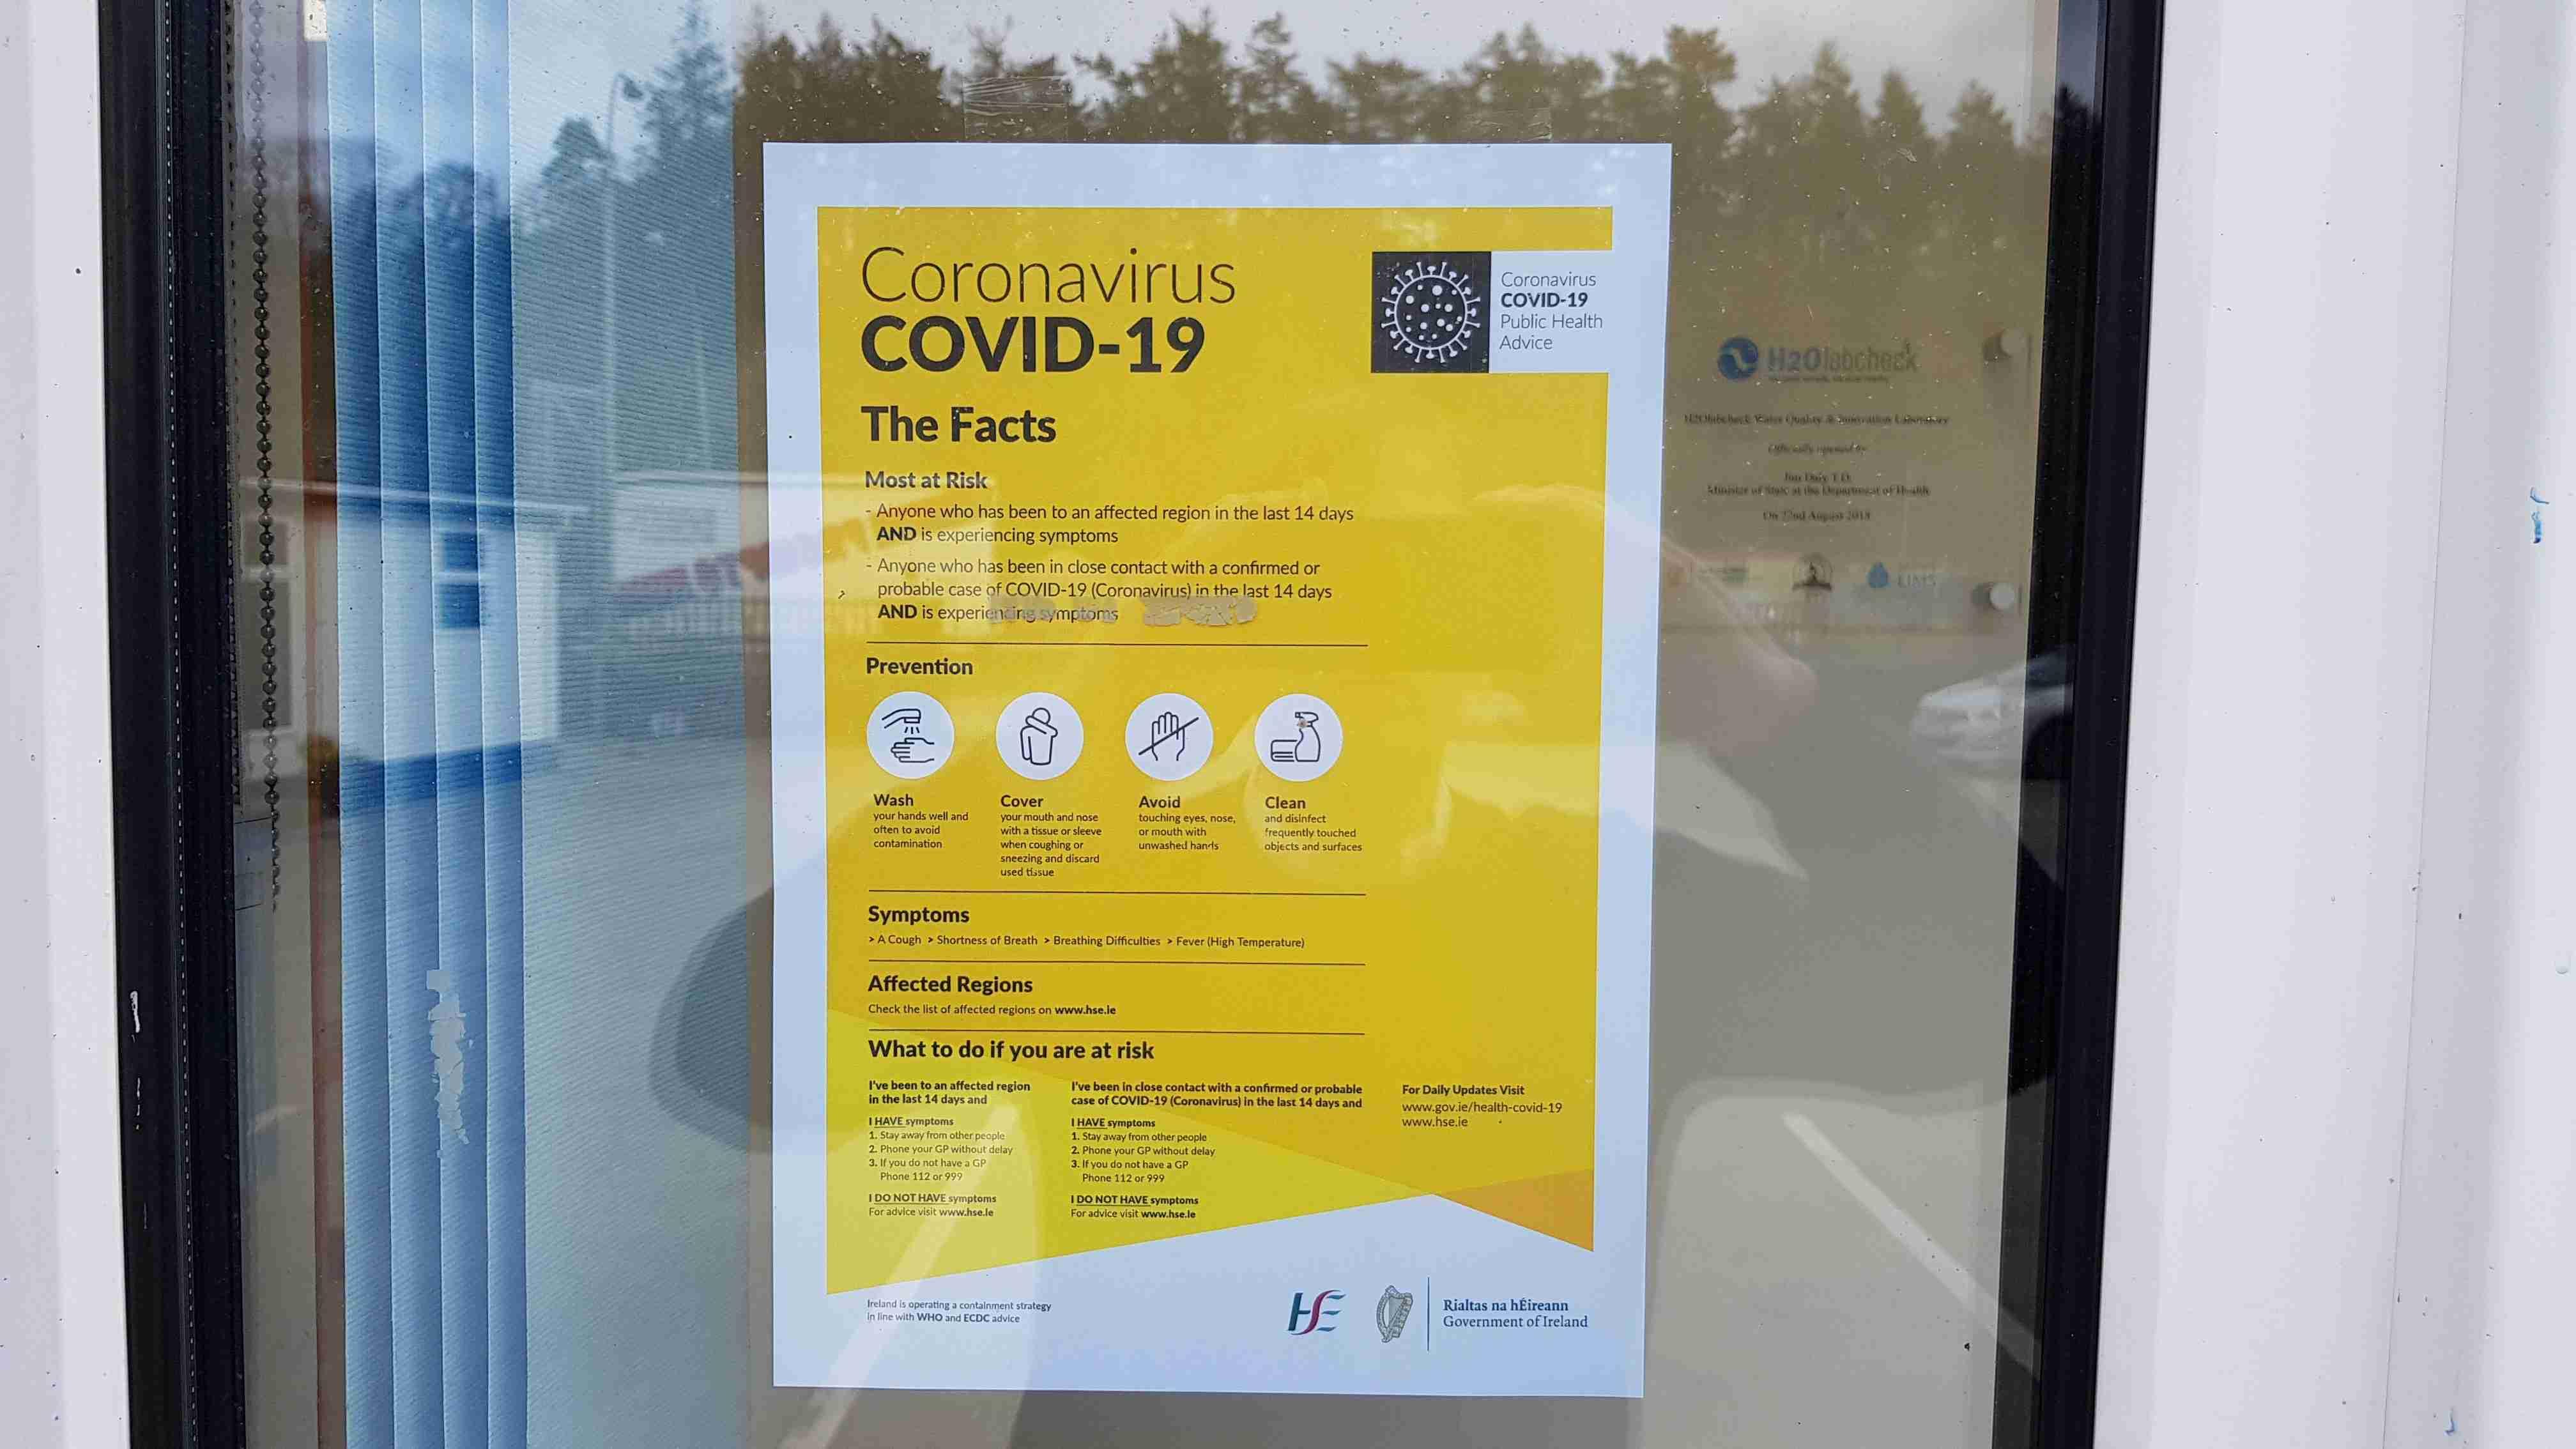 COVID19 Coronavirus HSE Poster Pandemic Preparedness Plan